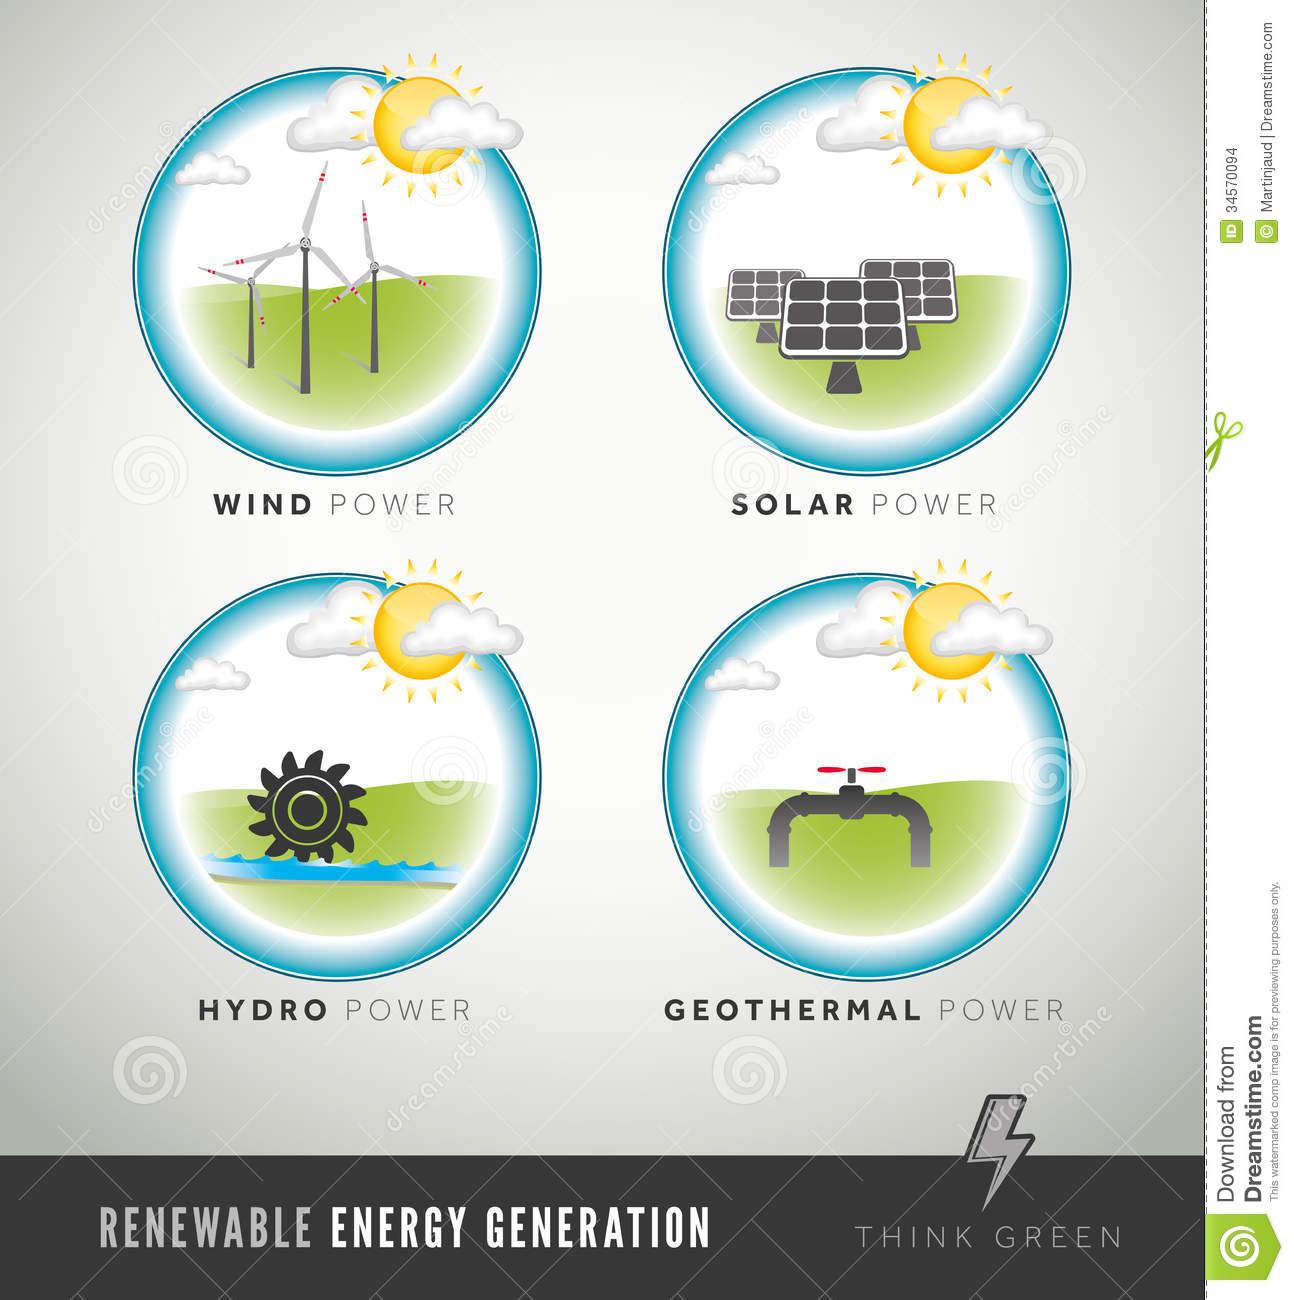 No energy generation clipart.